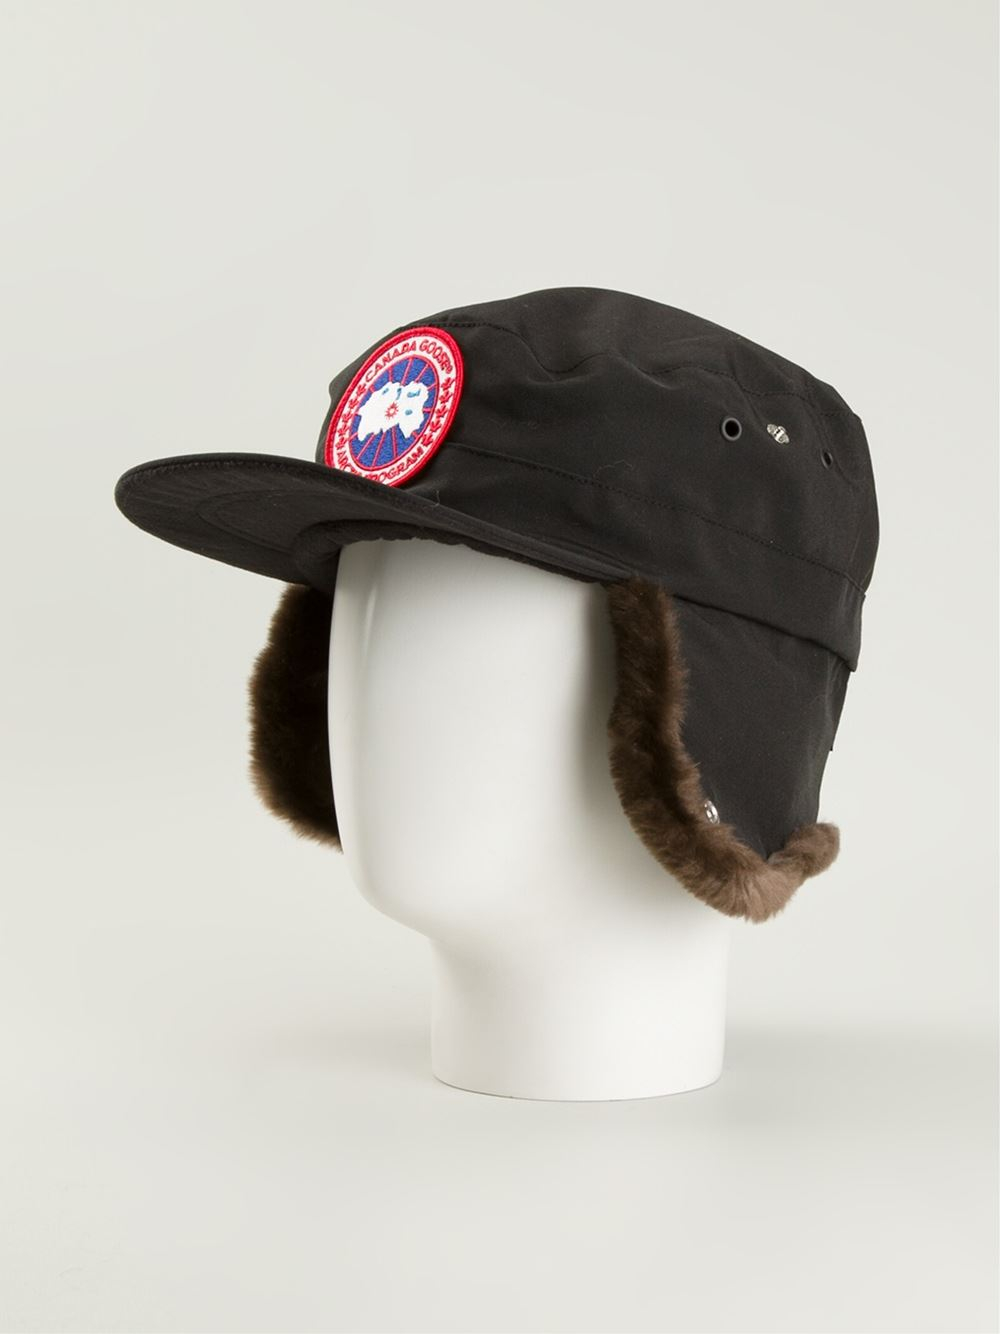 29a22264ff3ec Canada Goose Beaver Cap in Black for Men - Lyst